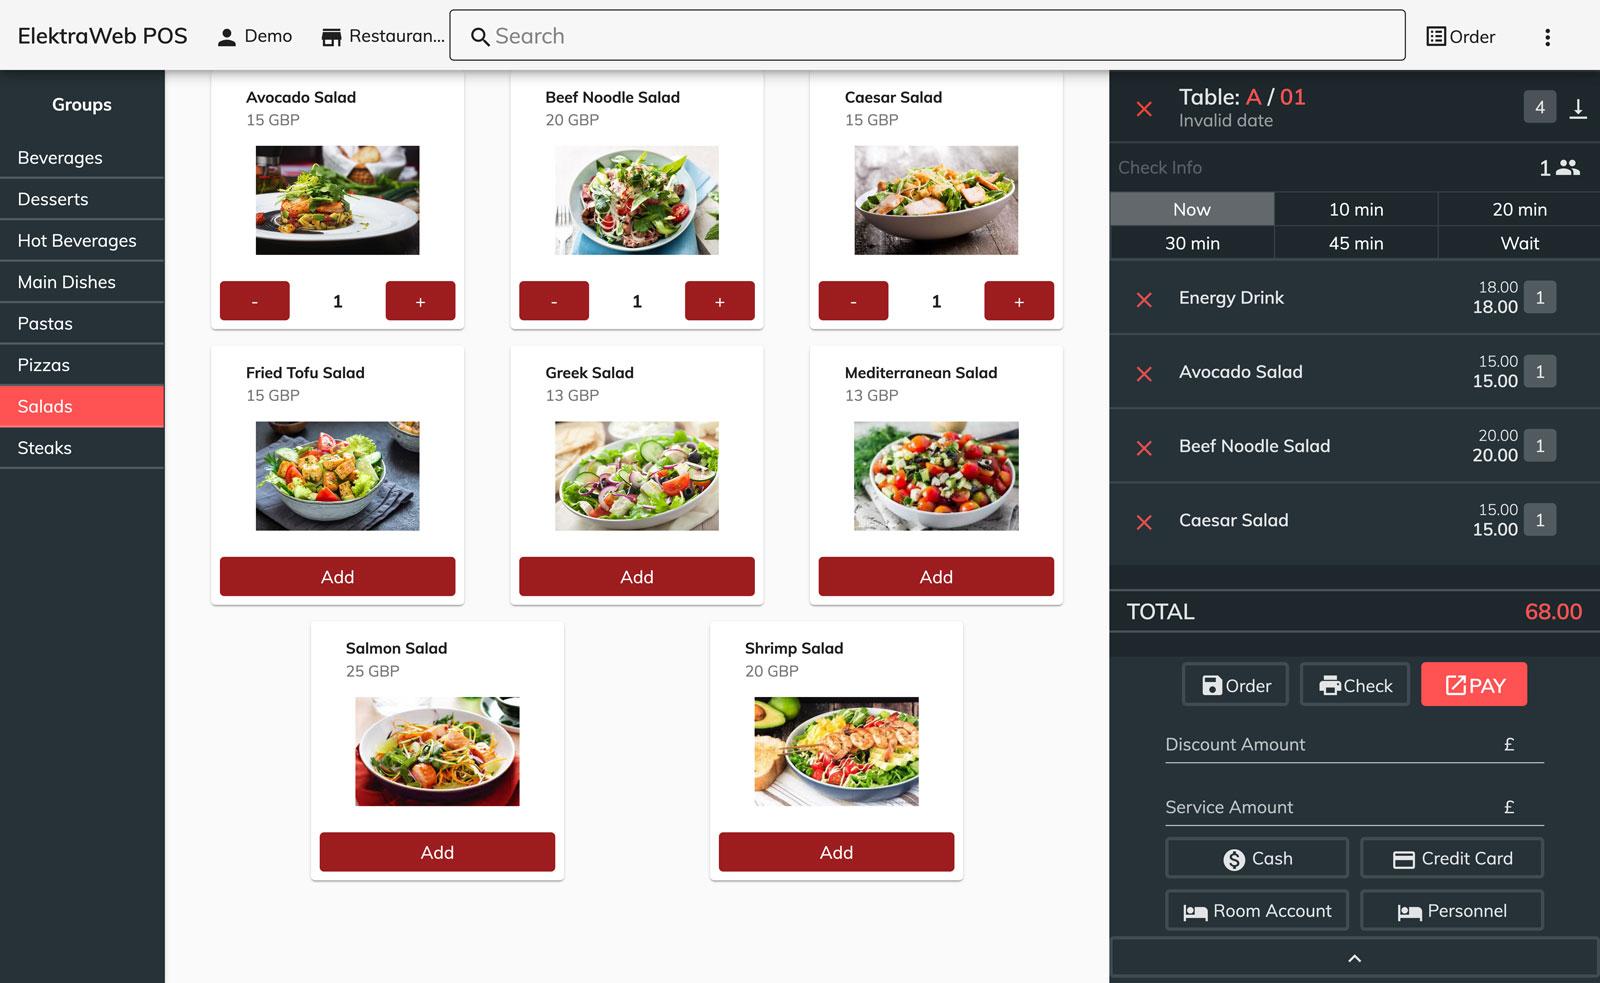 Web Based Pos Software- Hotel Management System and Hotel Program Restaurant Management Demo Screen